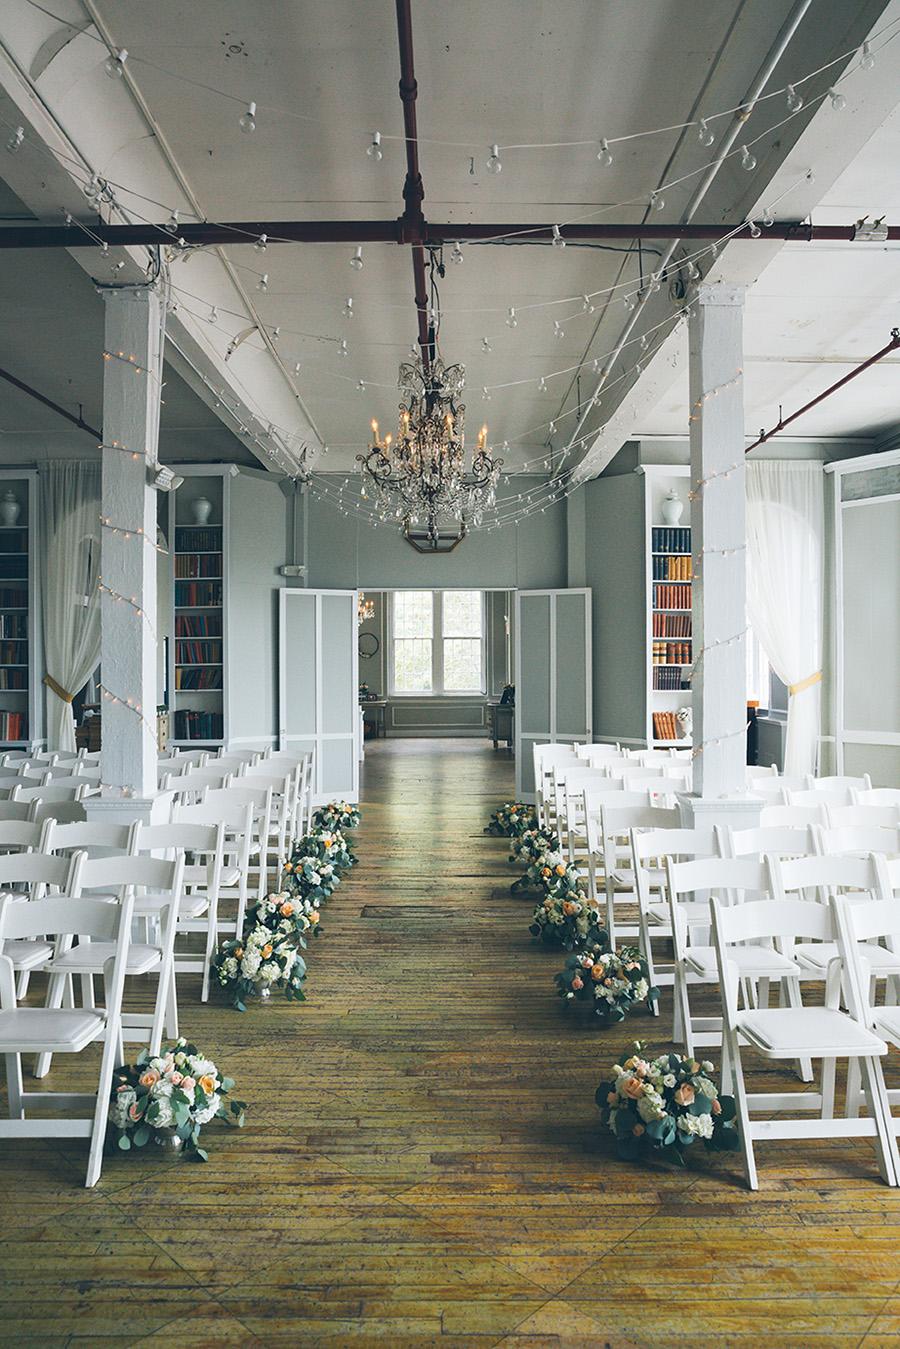 LIN-JOEY-NYC-WEDDING-METROPOLITANBUILDING-DETAILS-CYNTHIACHUNG-0105.jpg